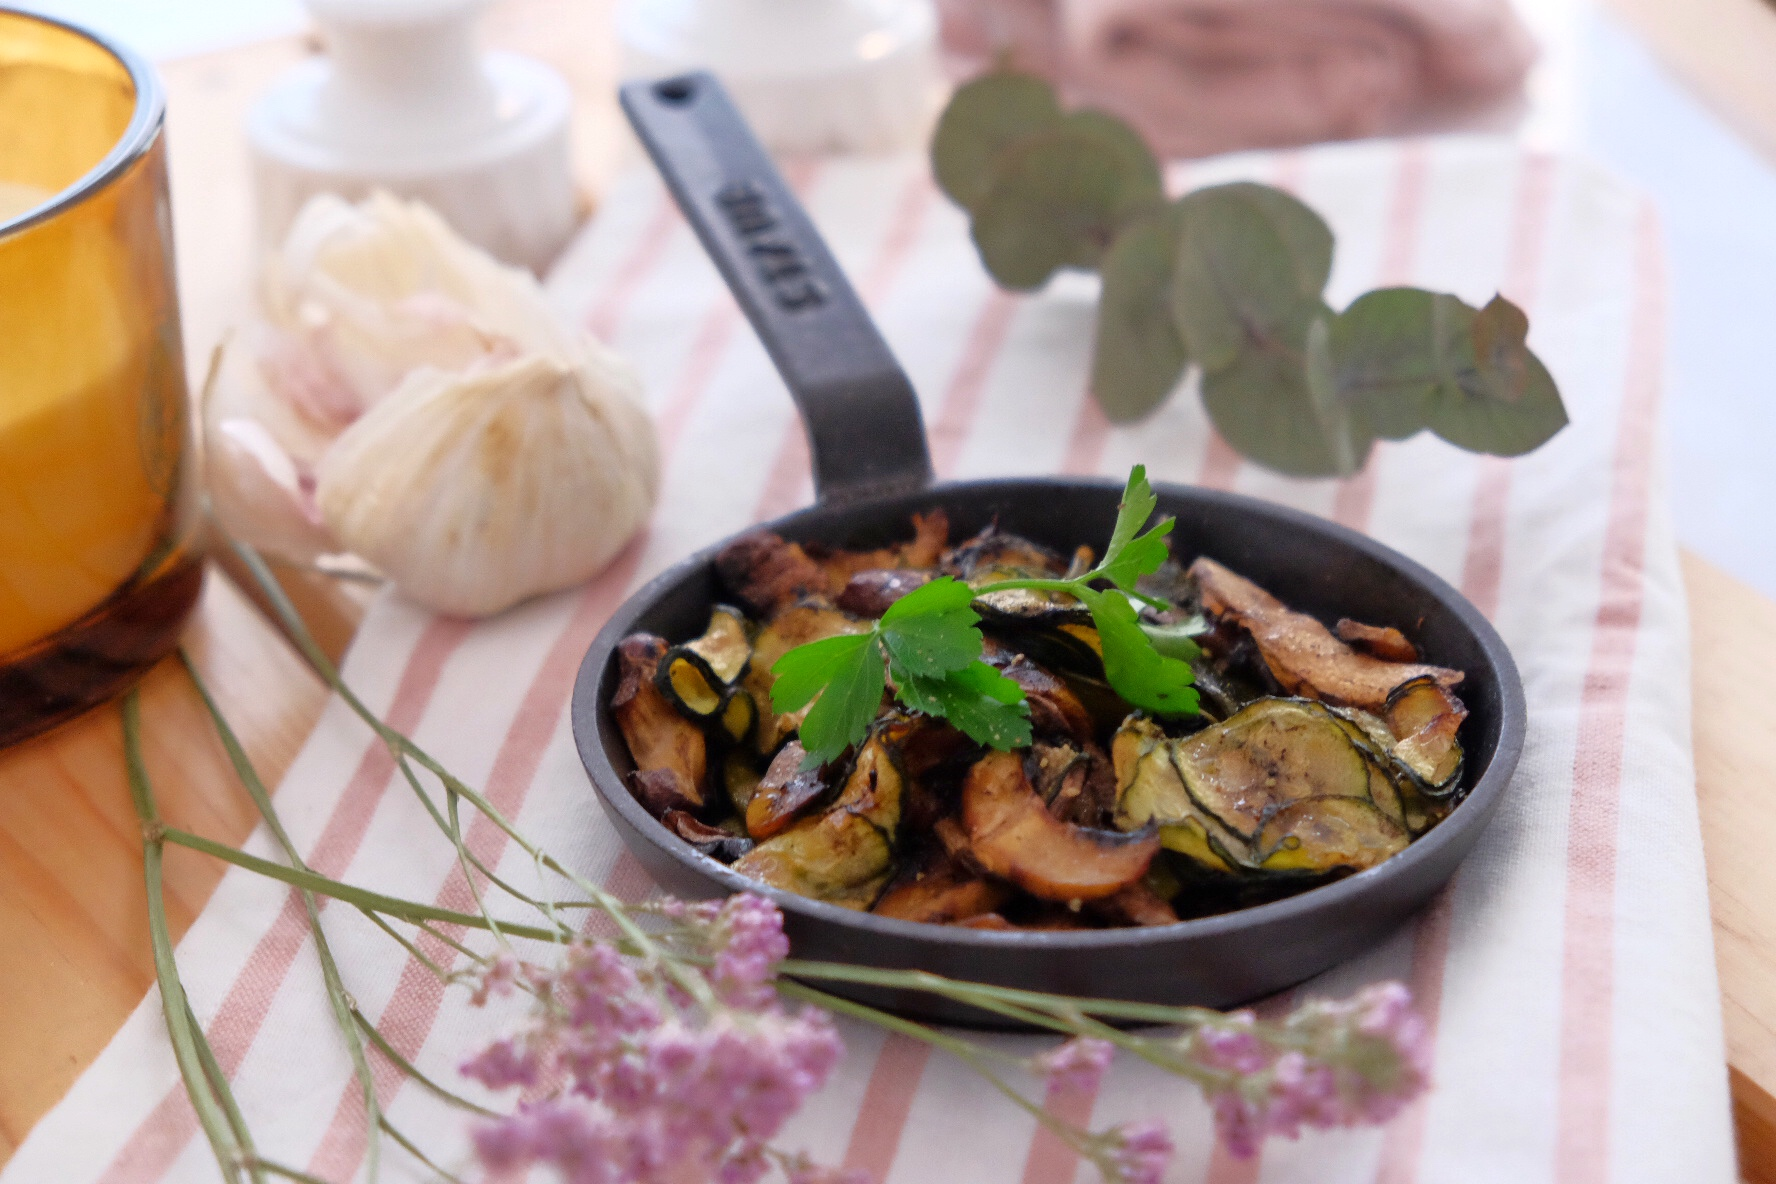 Veggies with black garlic